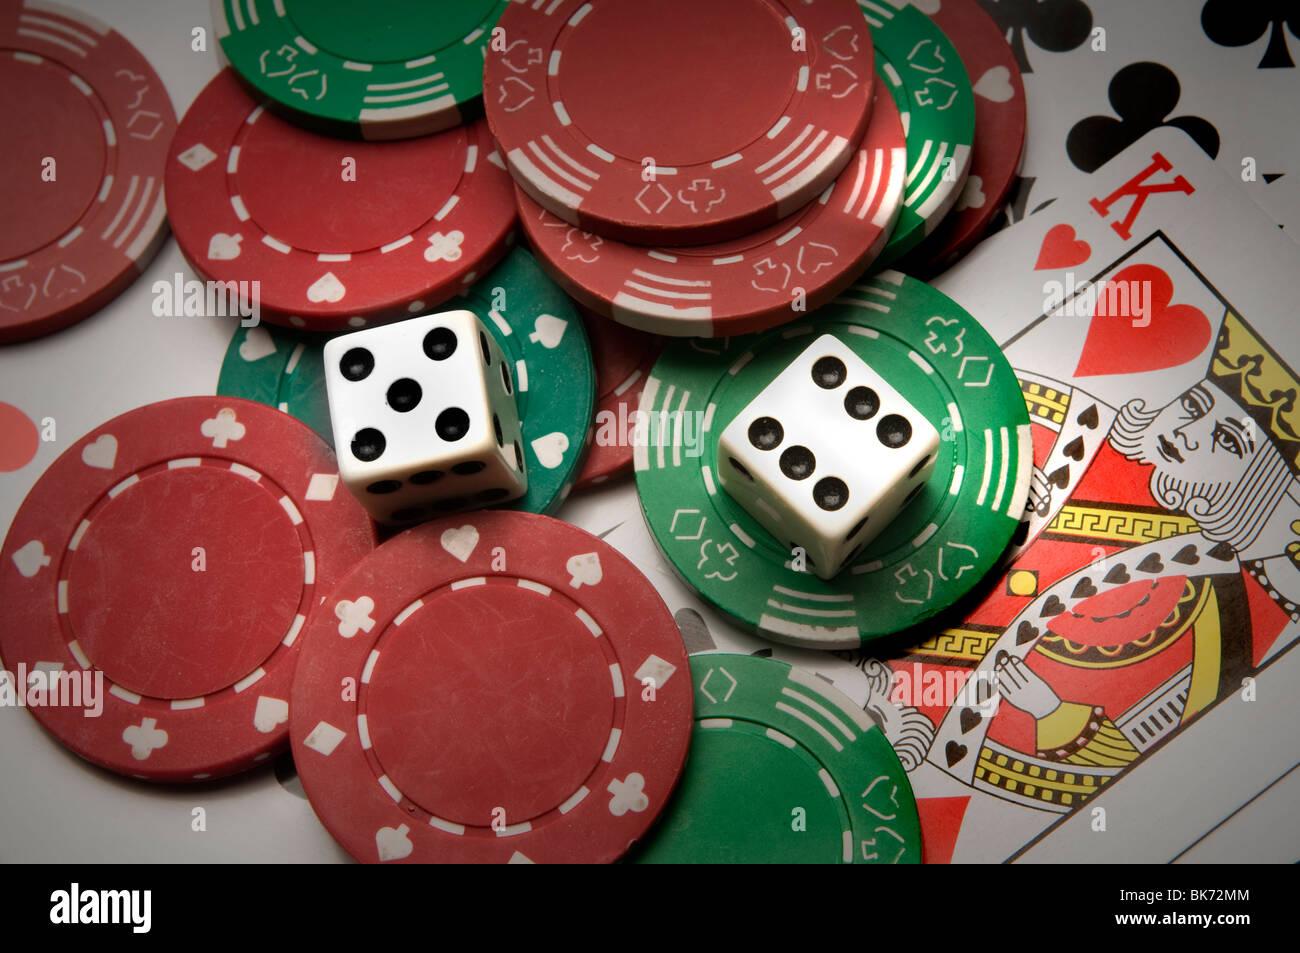 gambling roulette table